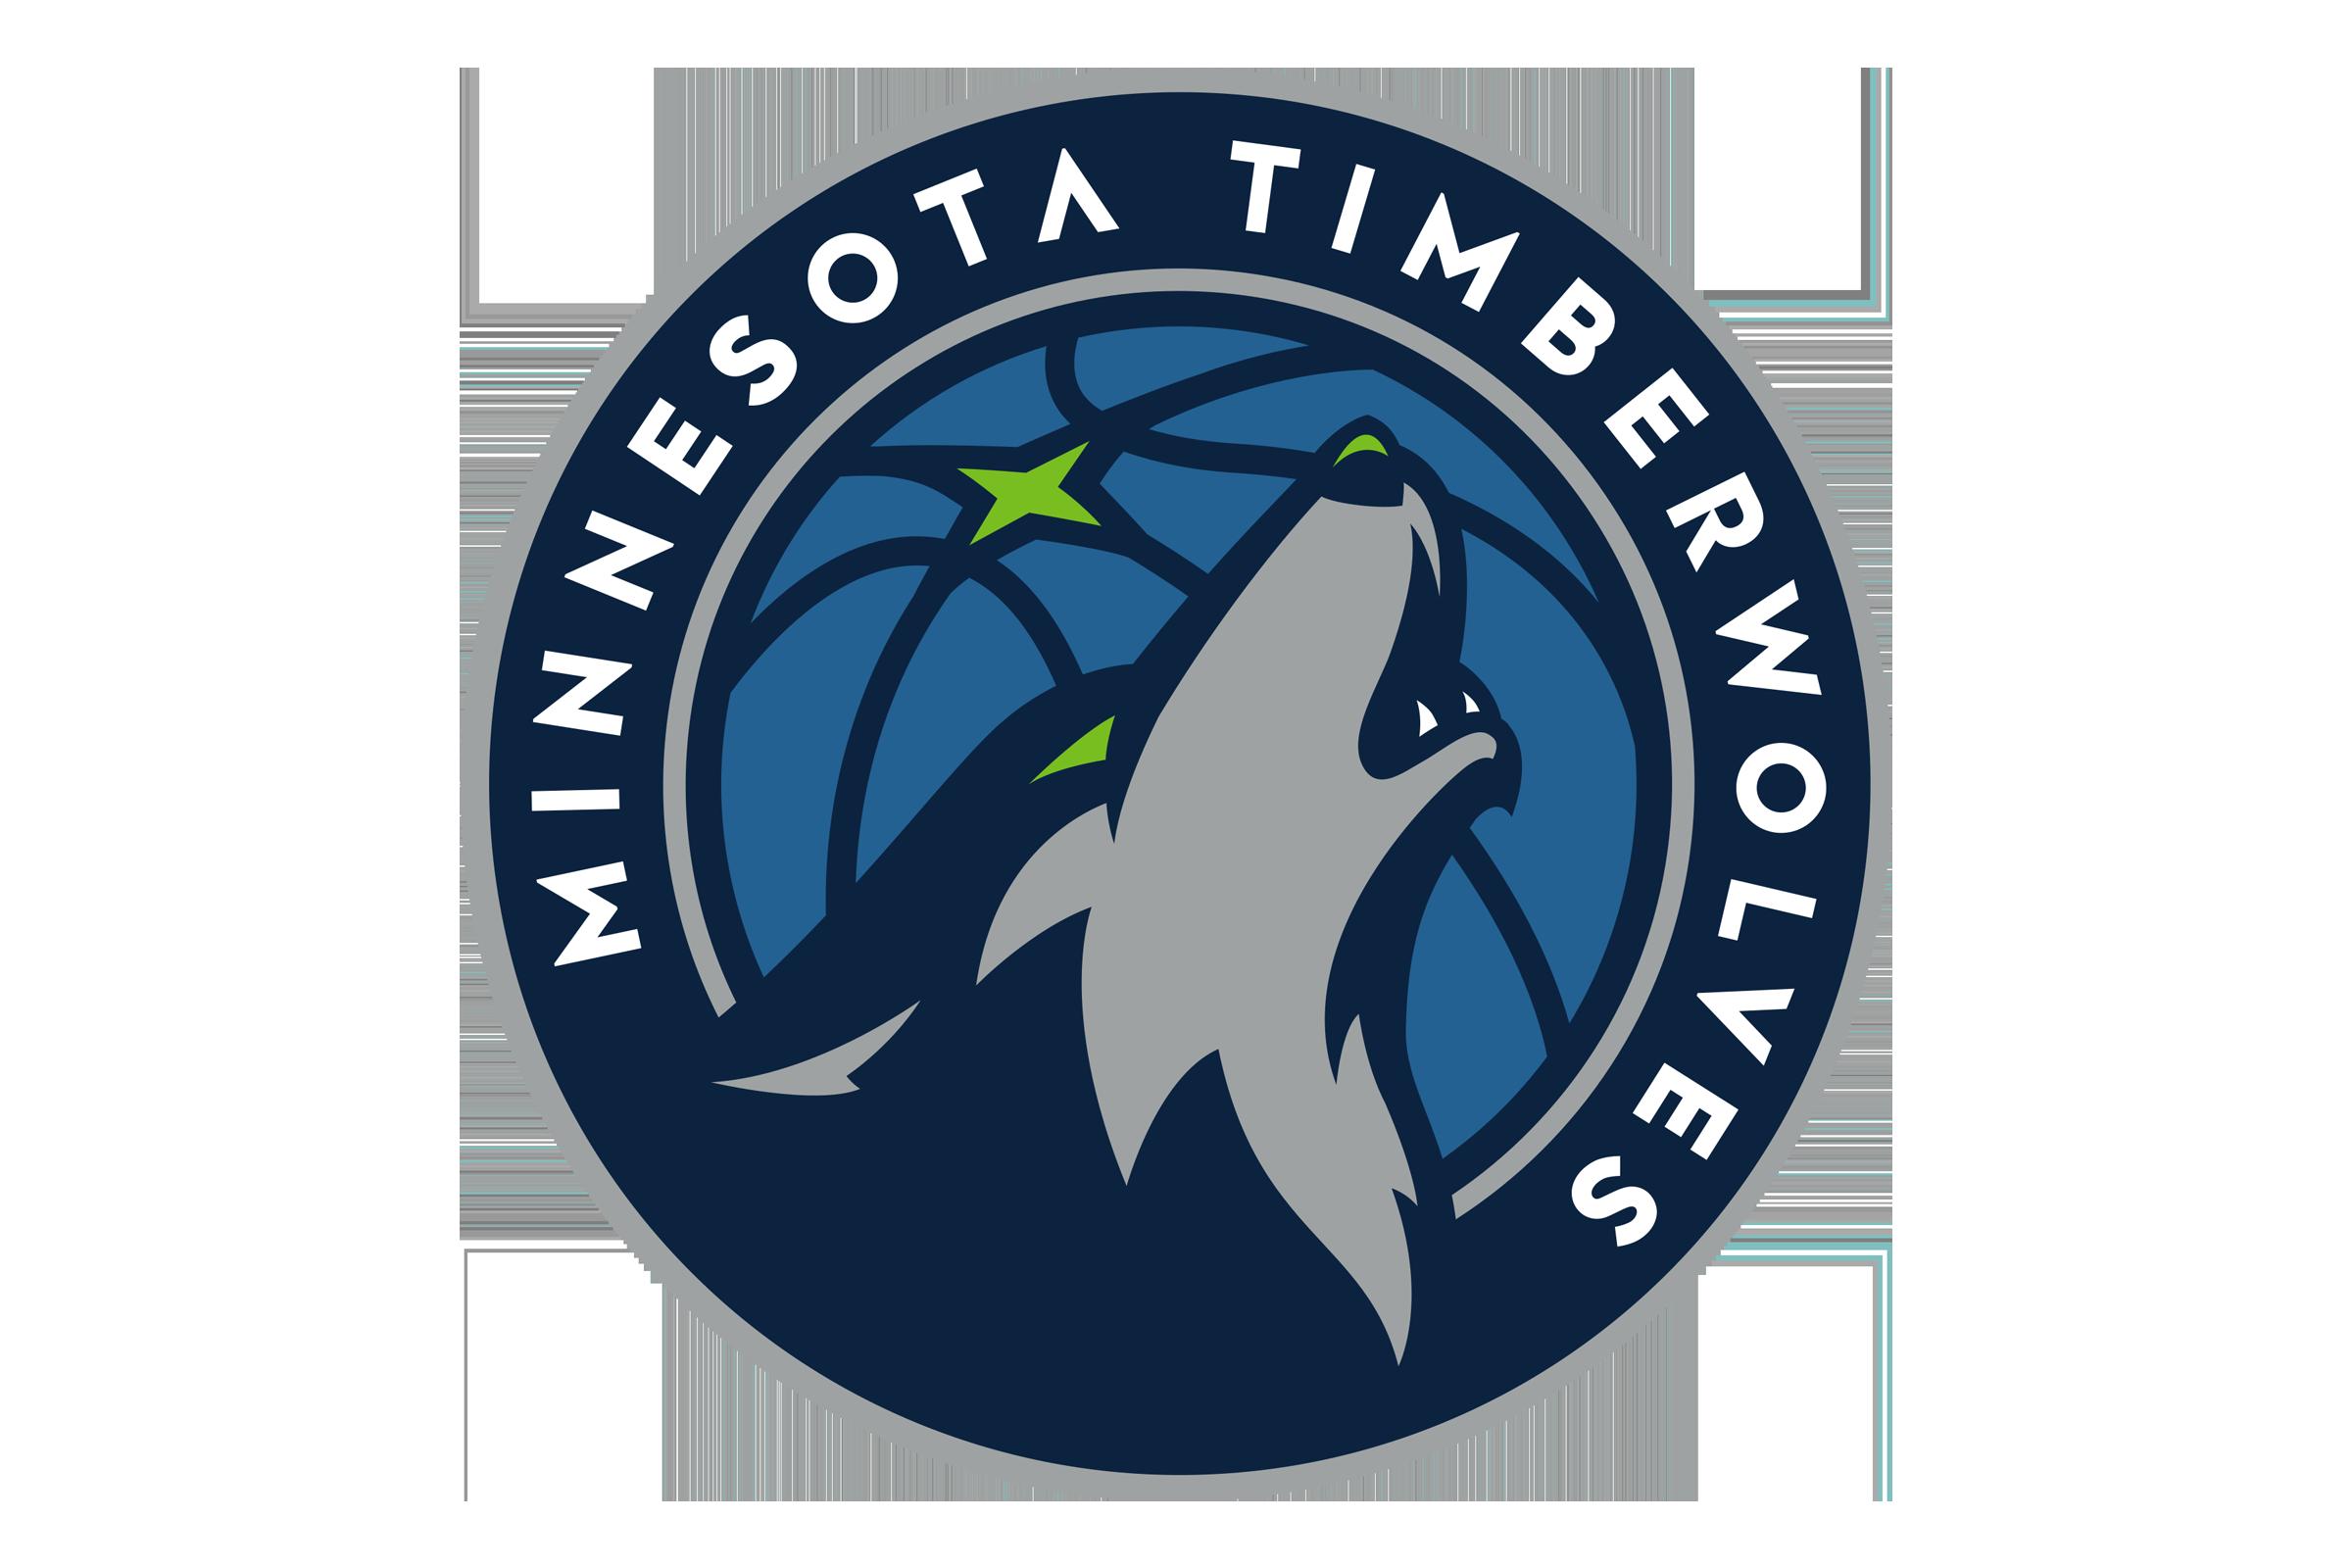 Minnesota Timberwolves - 0.08% interaction rate - twitter(vs. 0.04% via league average)